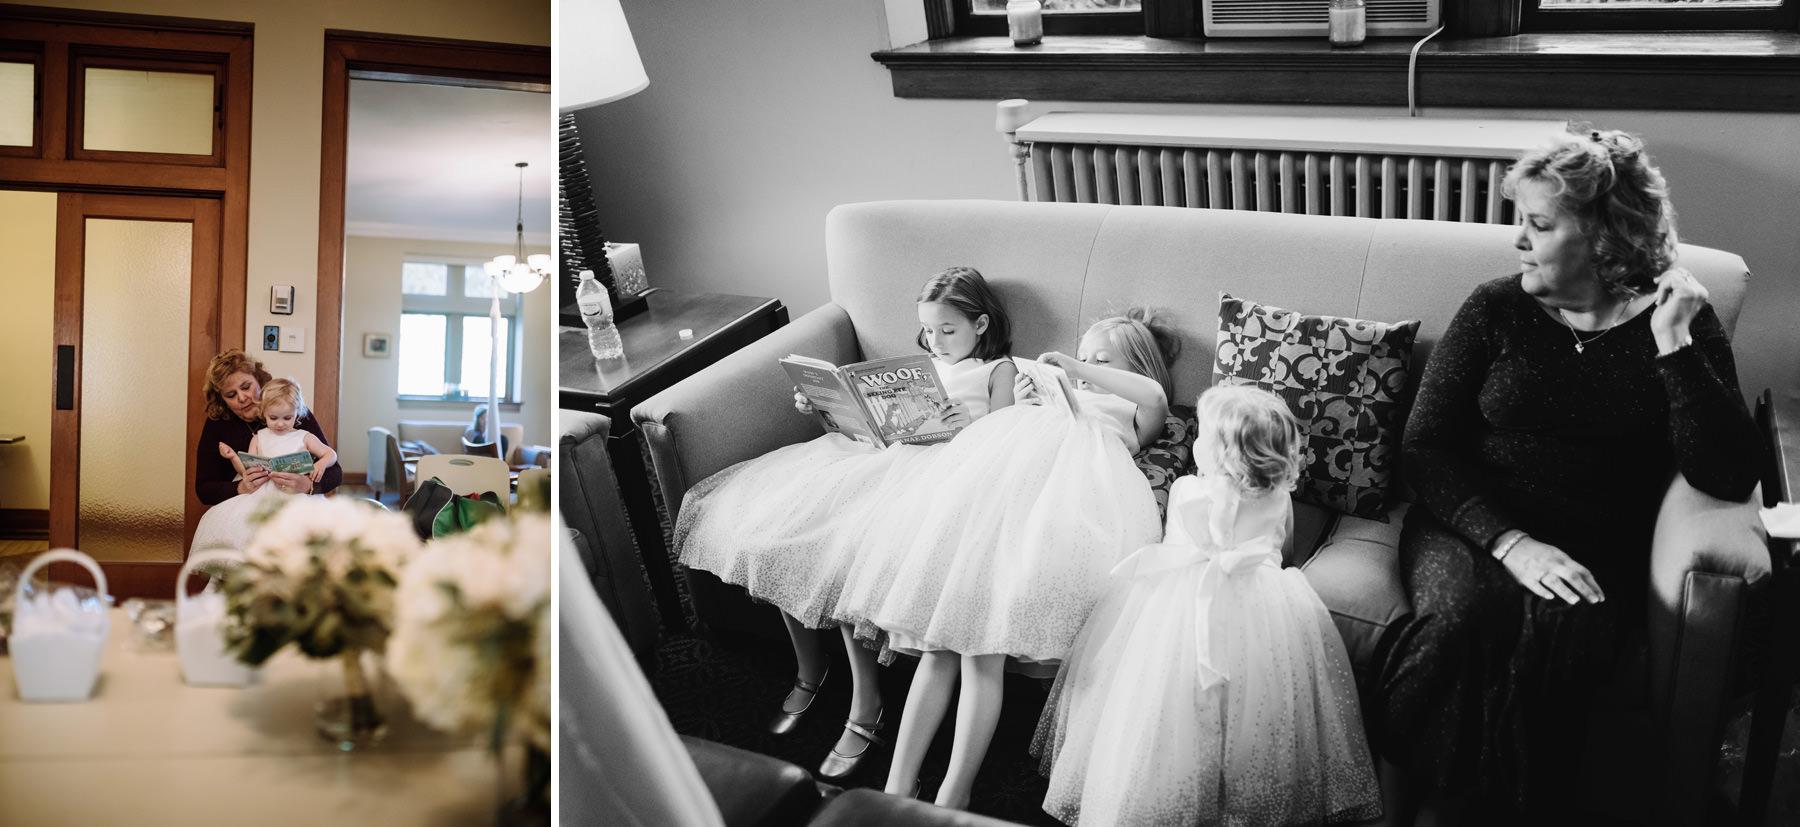 Memorial Presbyterian Wedding in St. Louis Missouri_Kindling Wedding Photography009.JPG